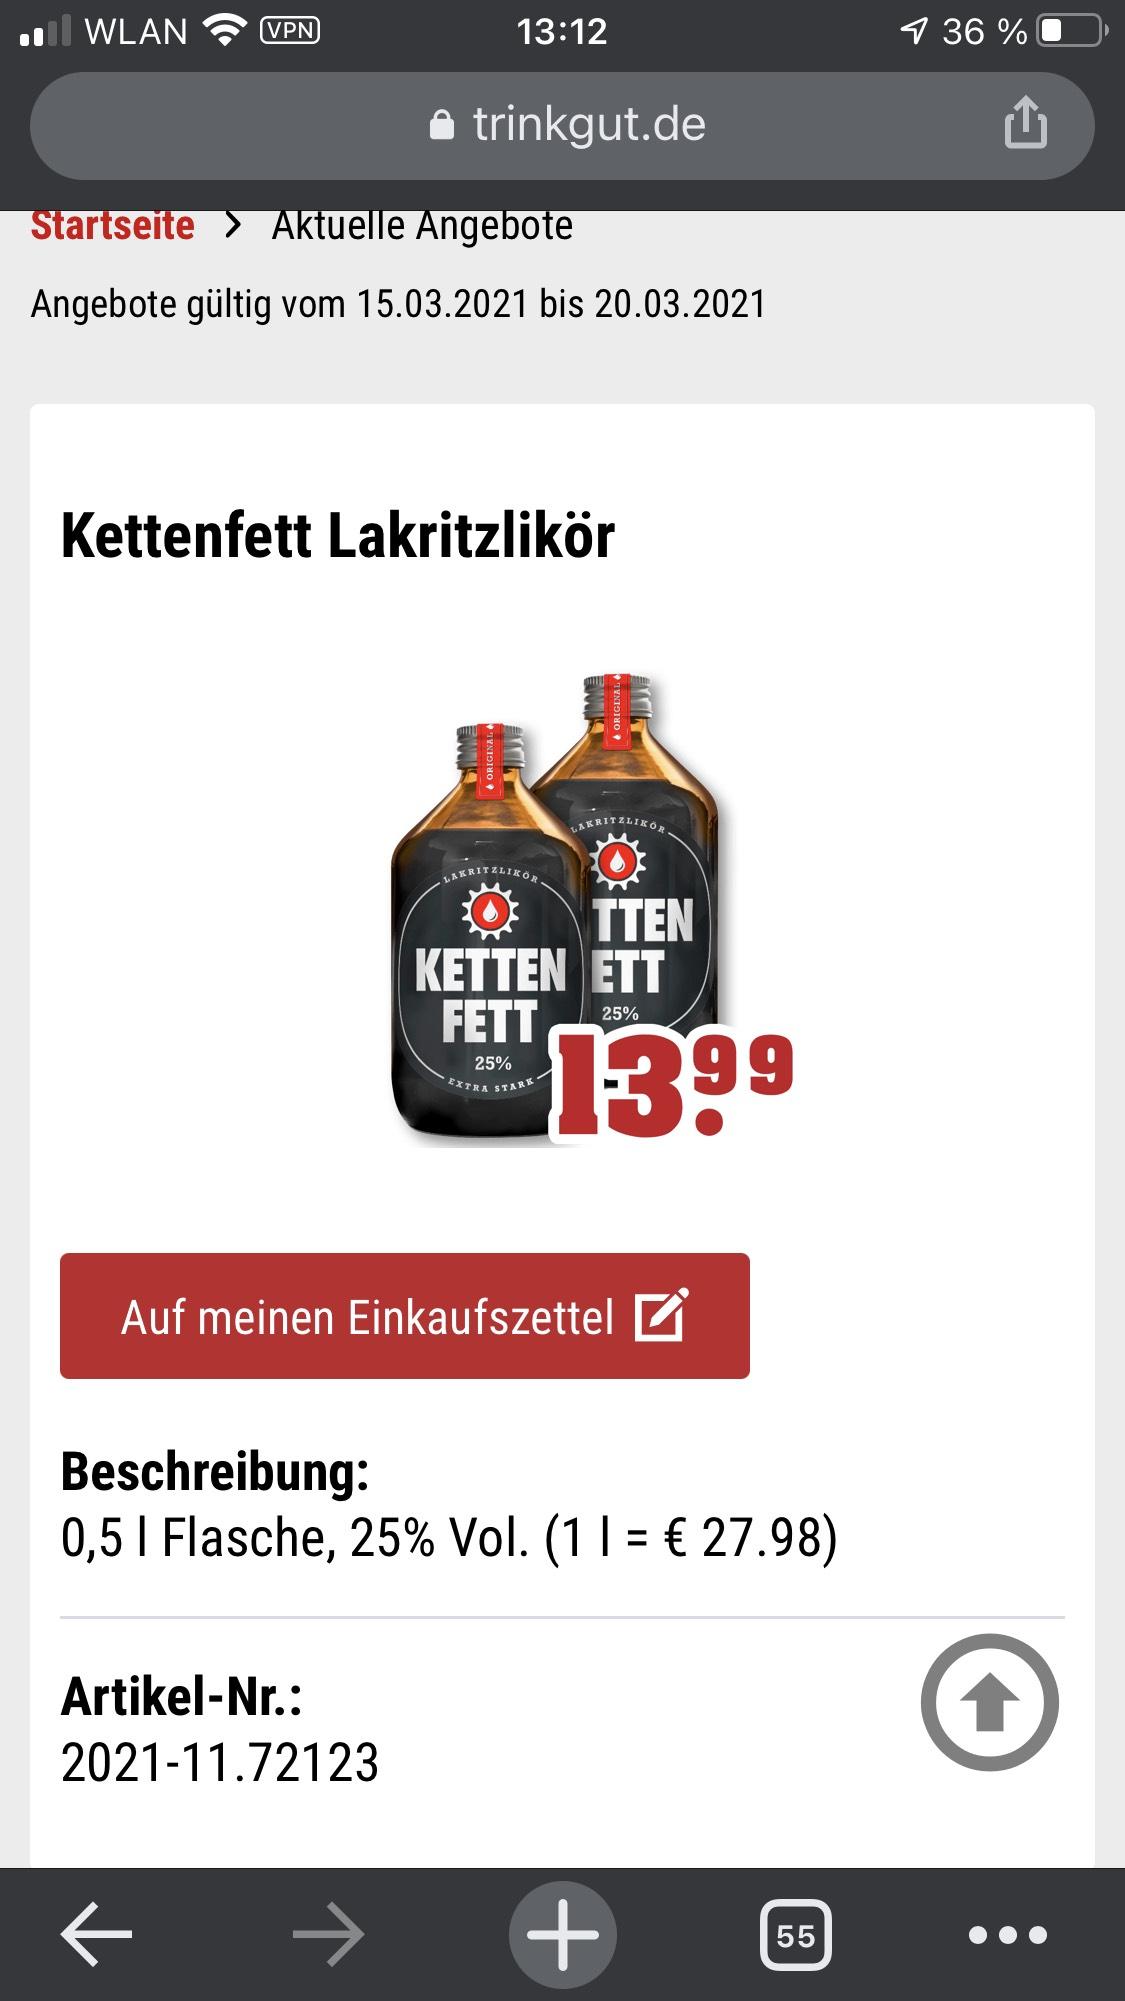 Kettenfett (Lakritzlikör) für 13.99€ bei trinkgut